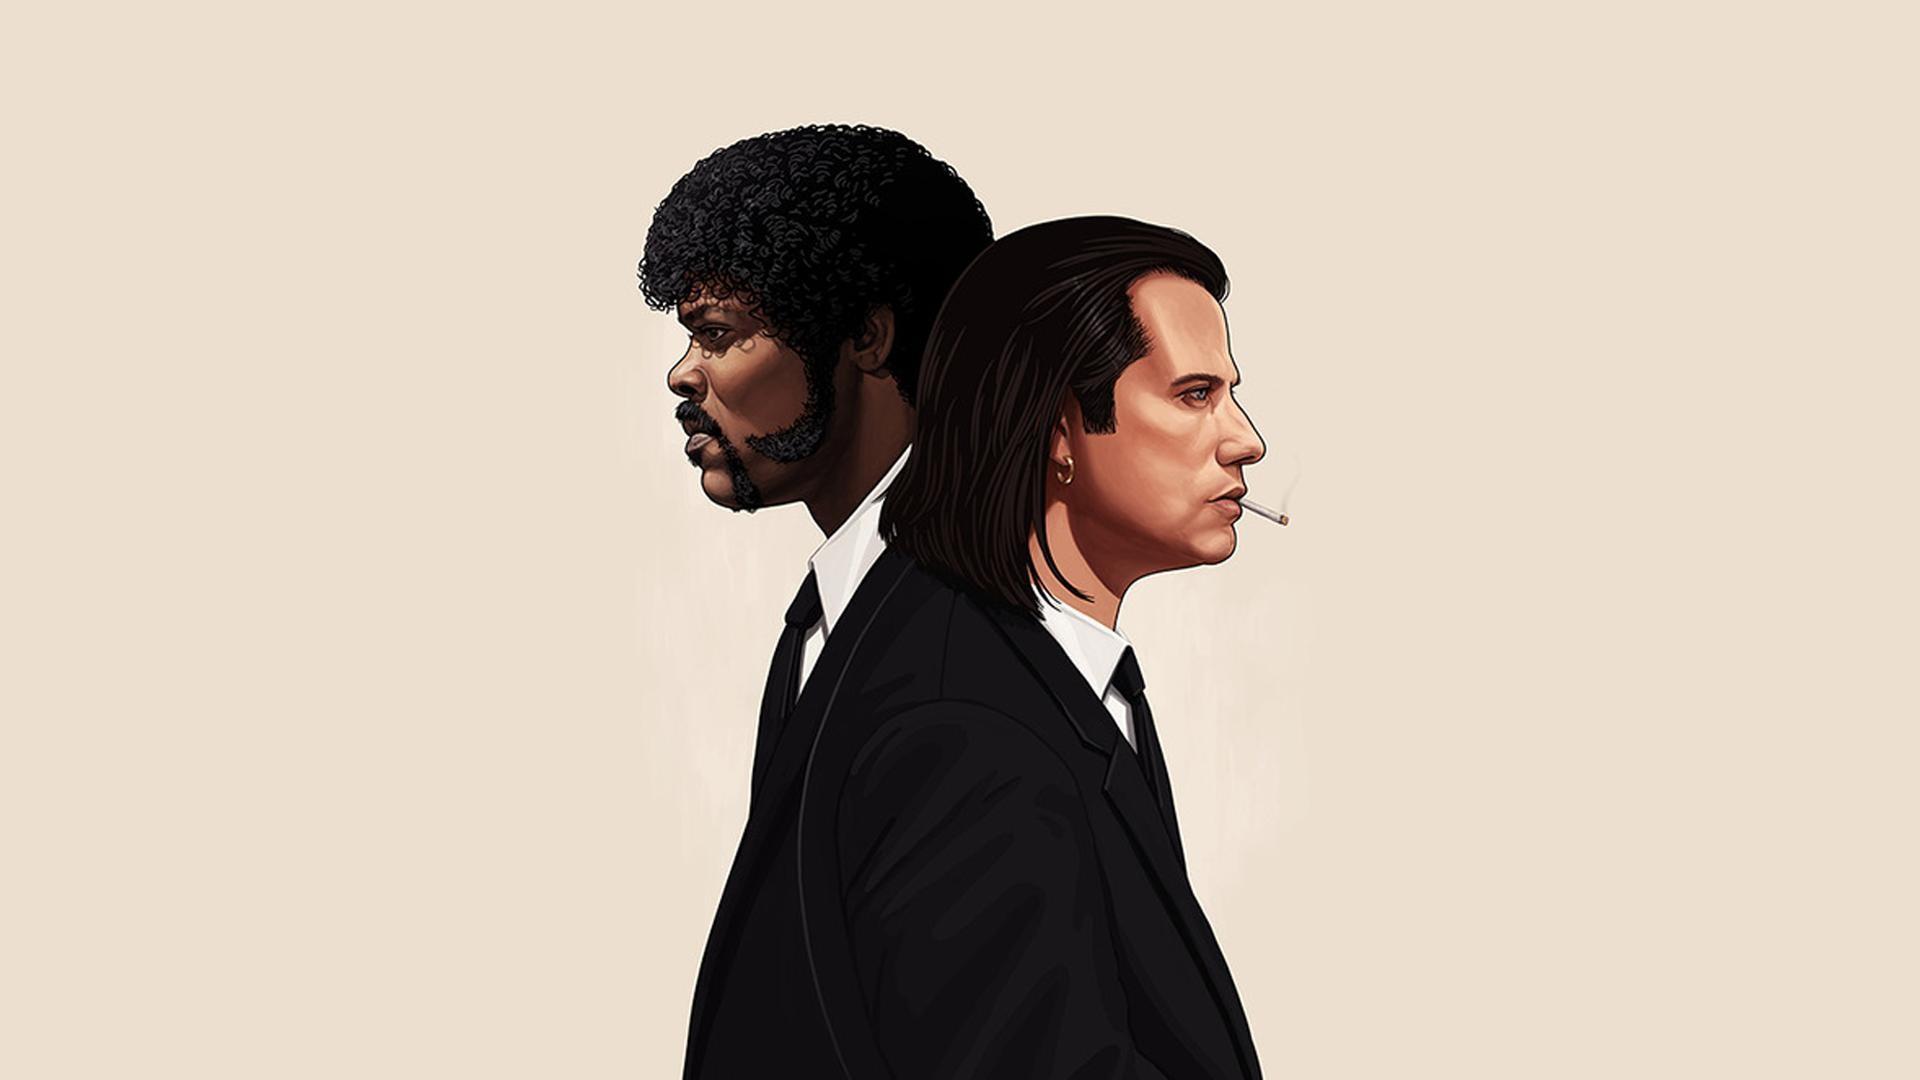 Movie – Pulp Fiction Wallpaper